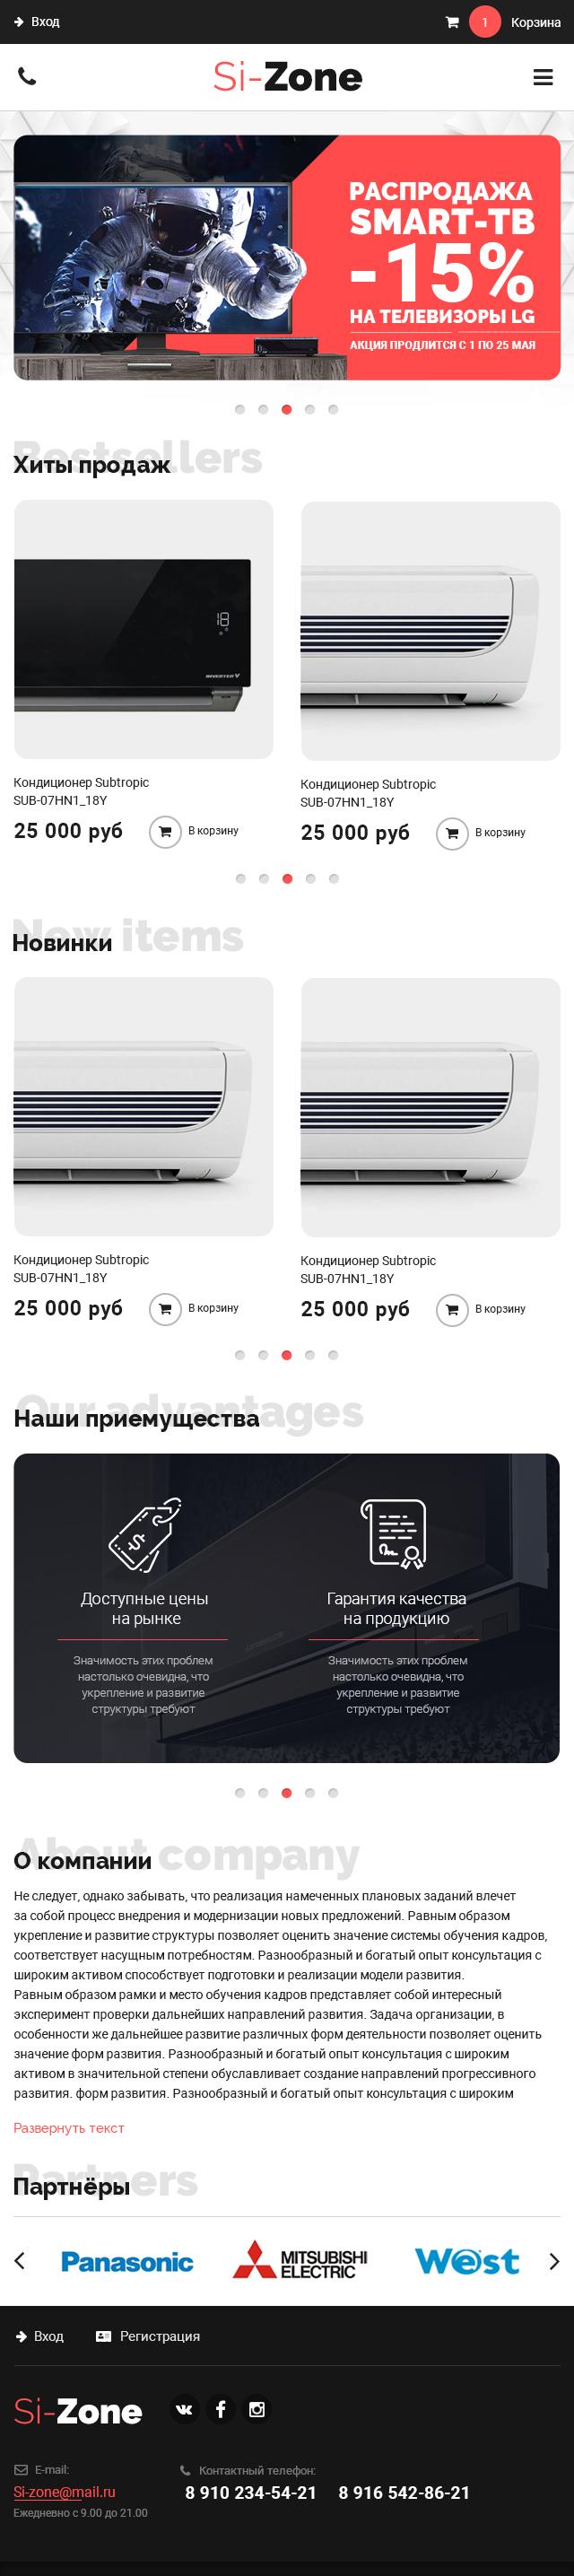 ООО «СМК» 640 px